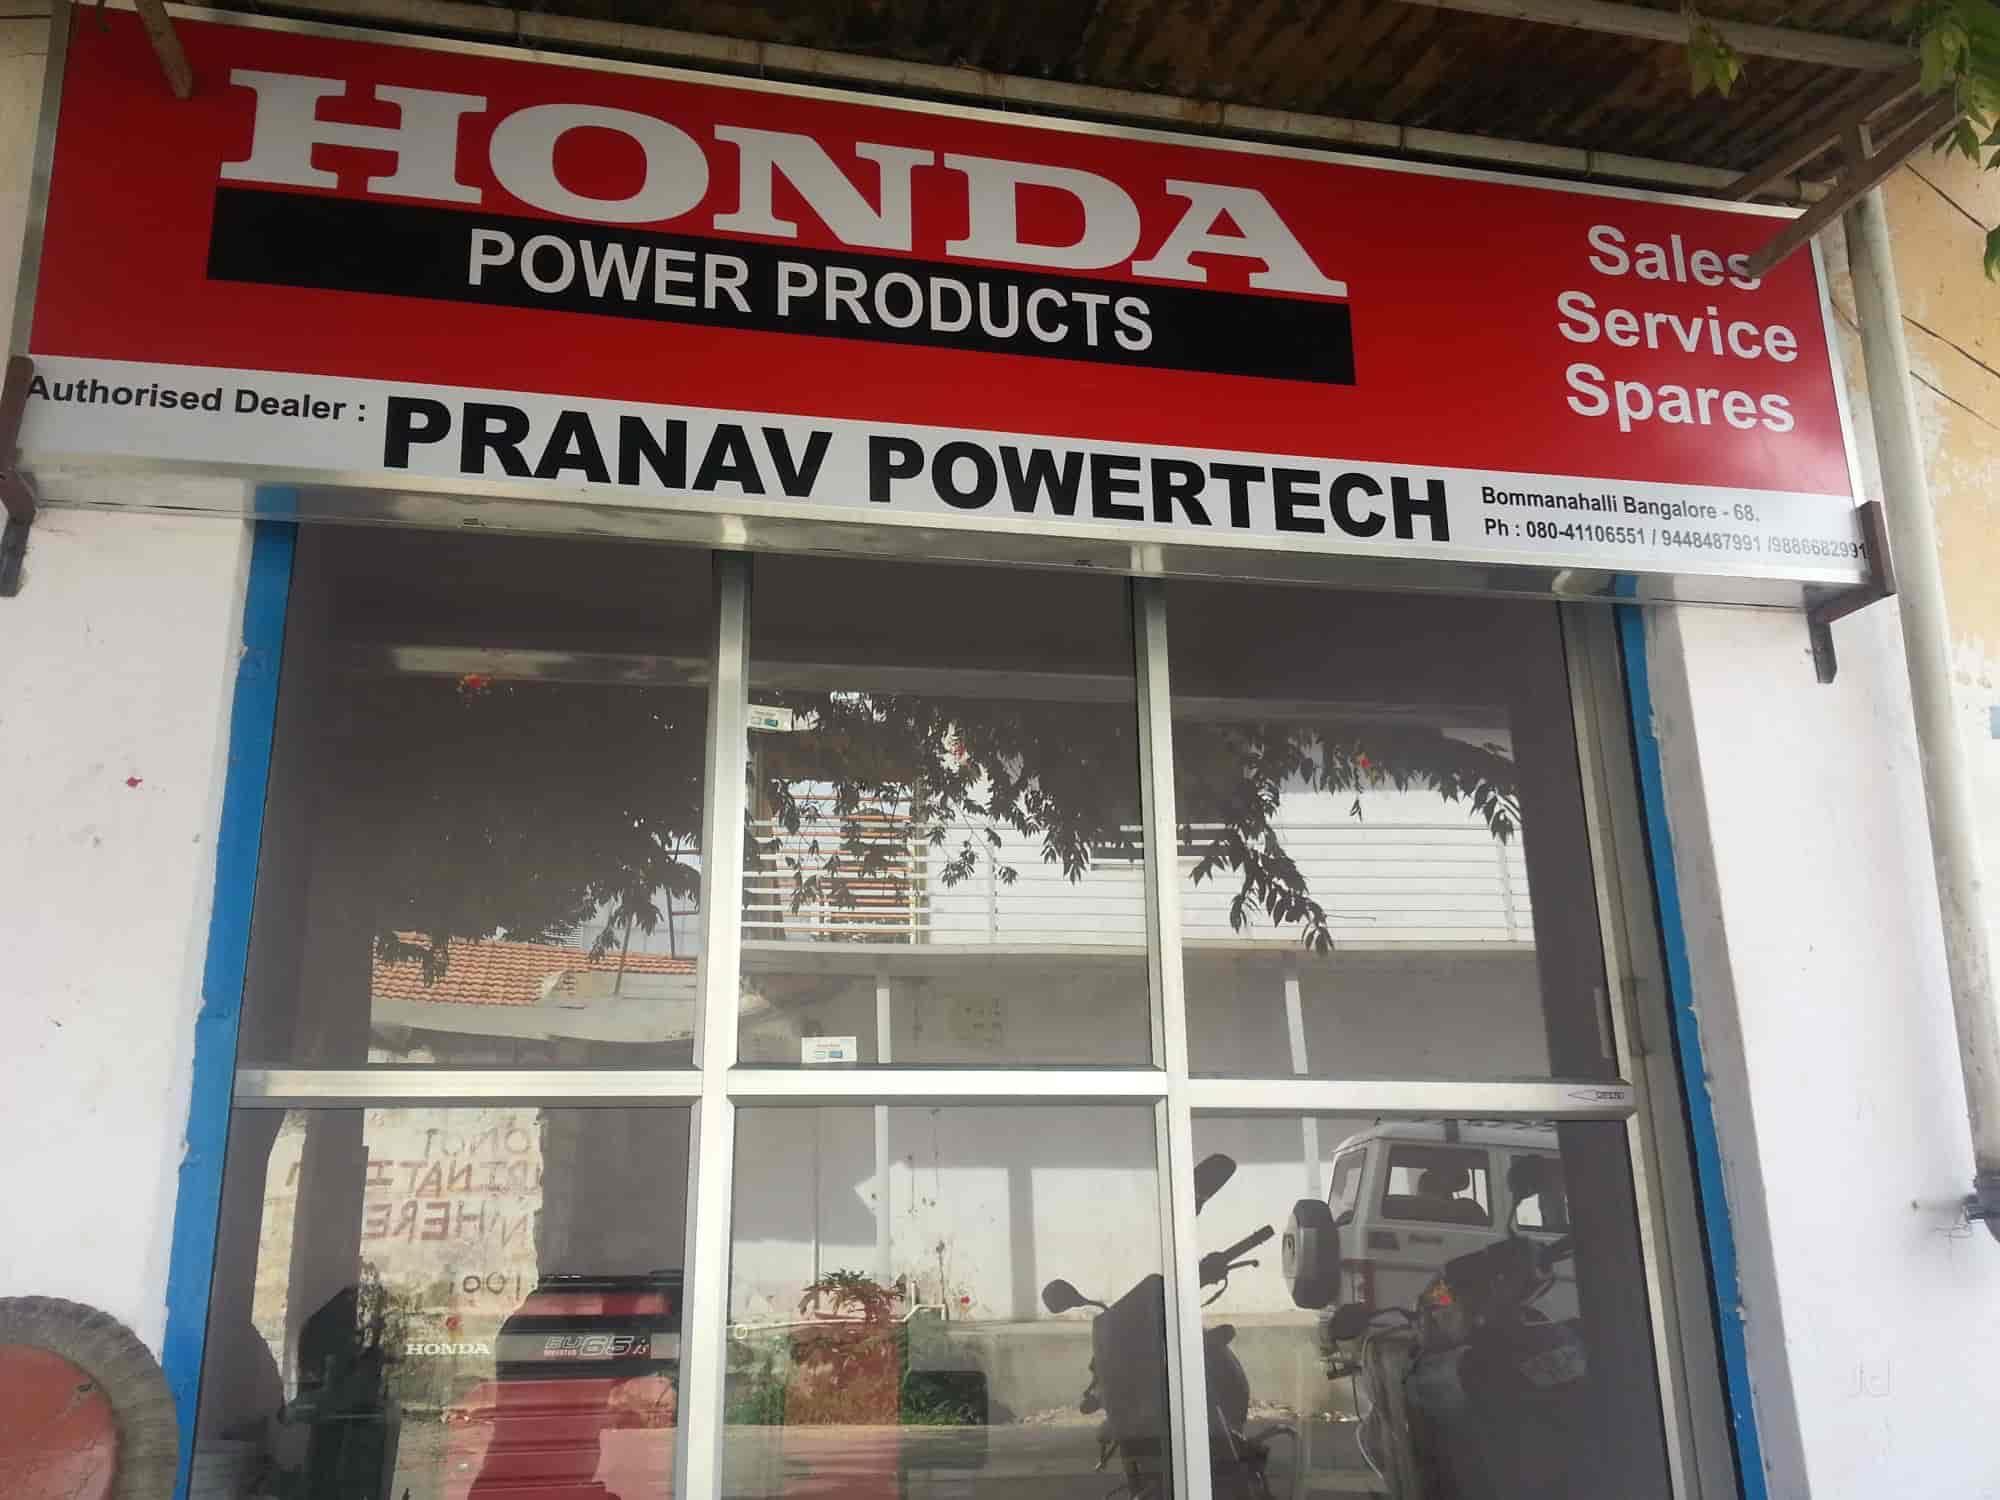 Pranav Power Tech Jc Road Diesel Generator Dealers in Bangalore